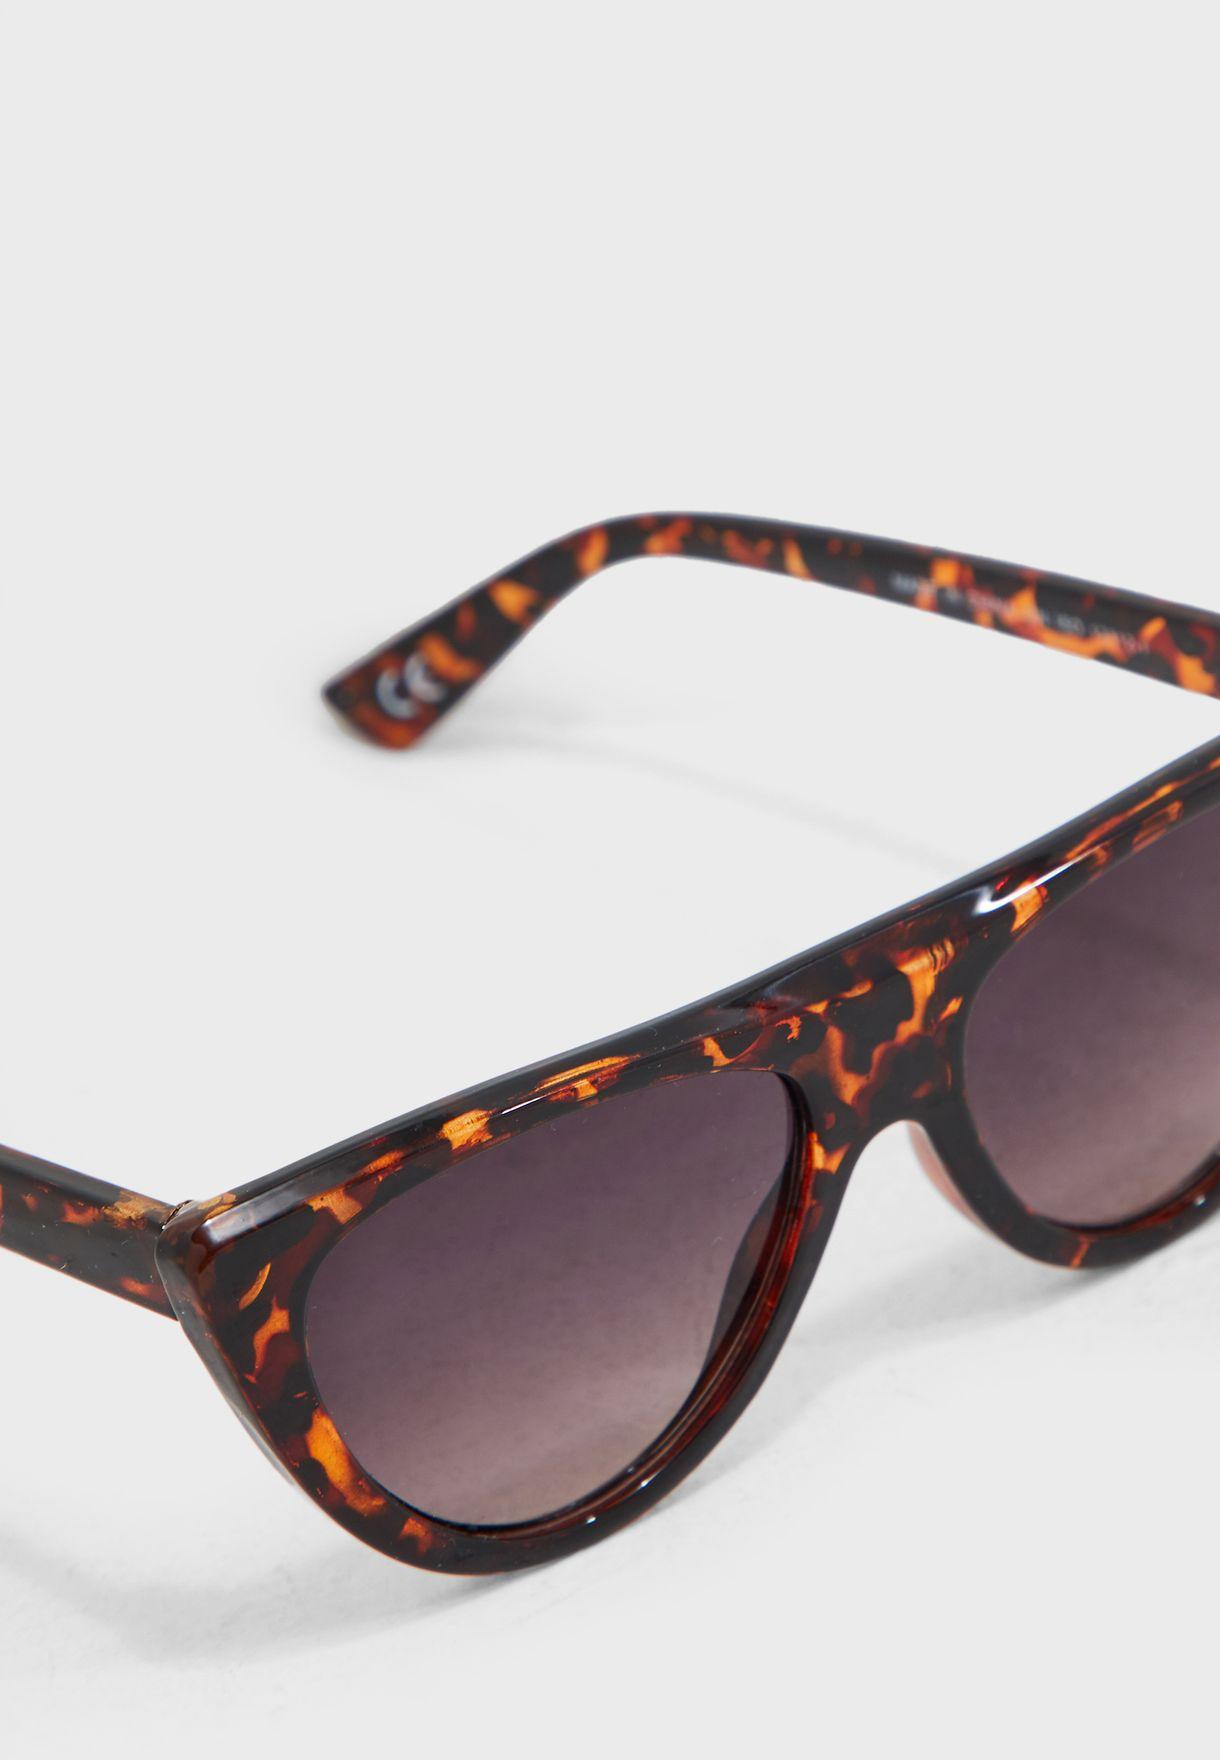 Flateye Flattop Cateye Sunglasses